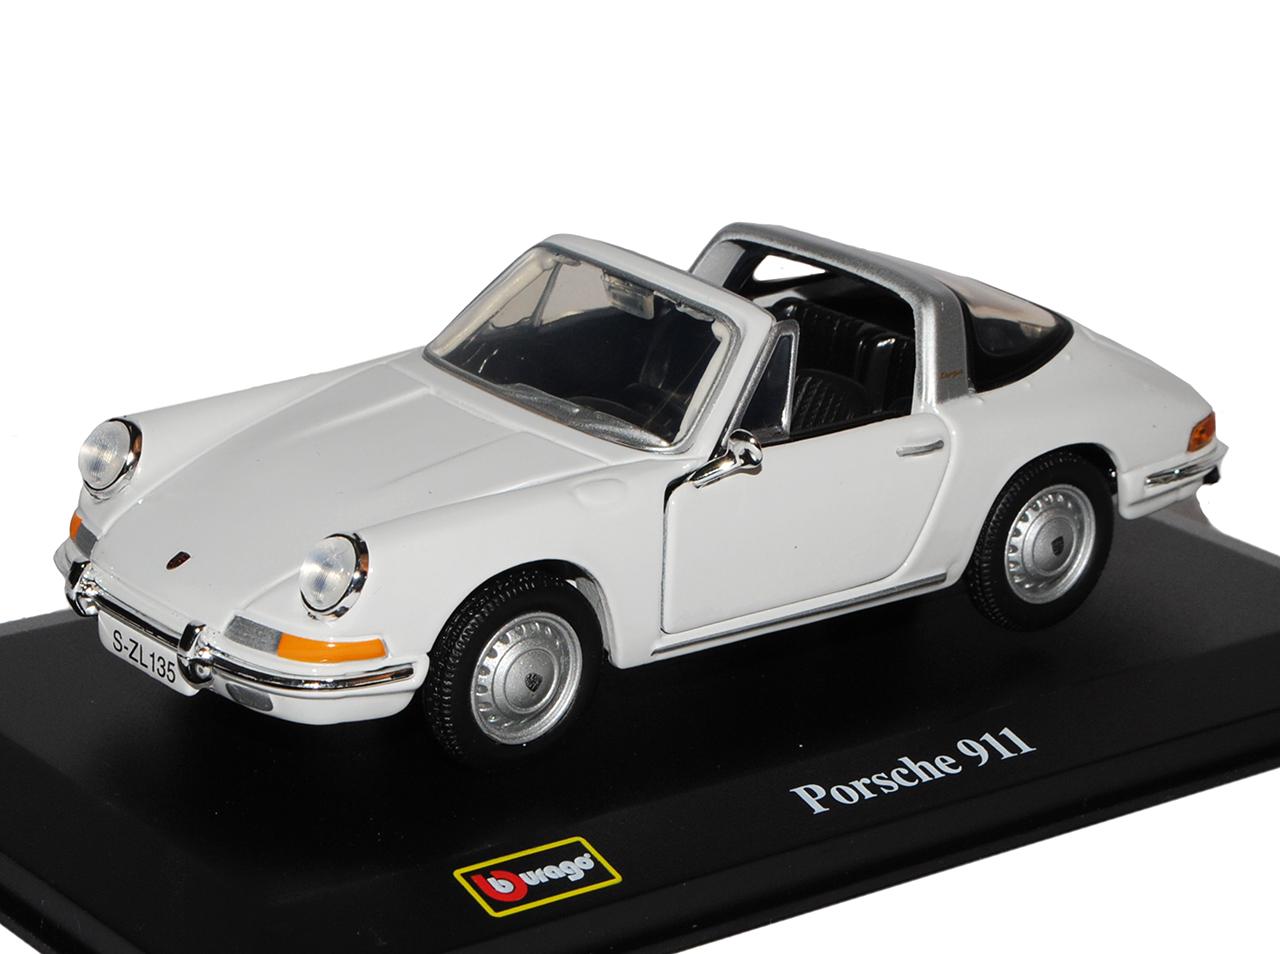 Porsche 911 Urmodell Targa Schwarz 1963-1973 1//32 Bburago Modell Auto mit oder..